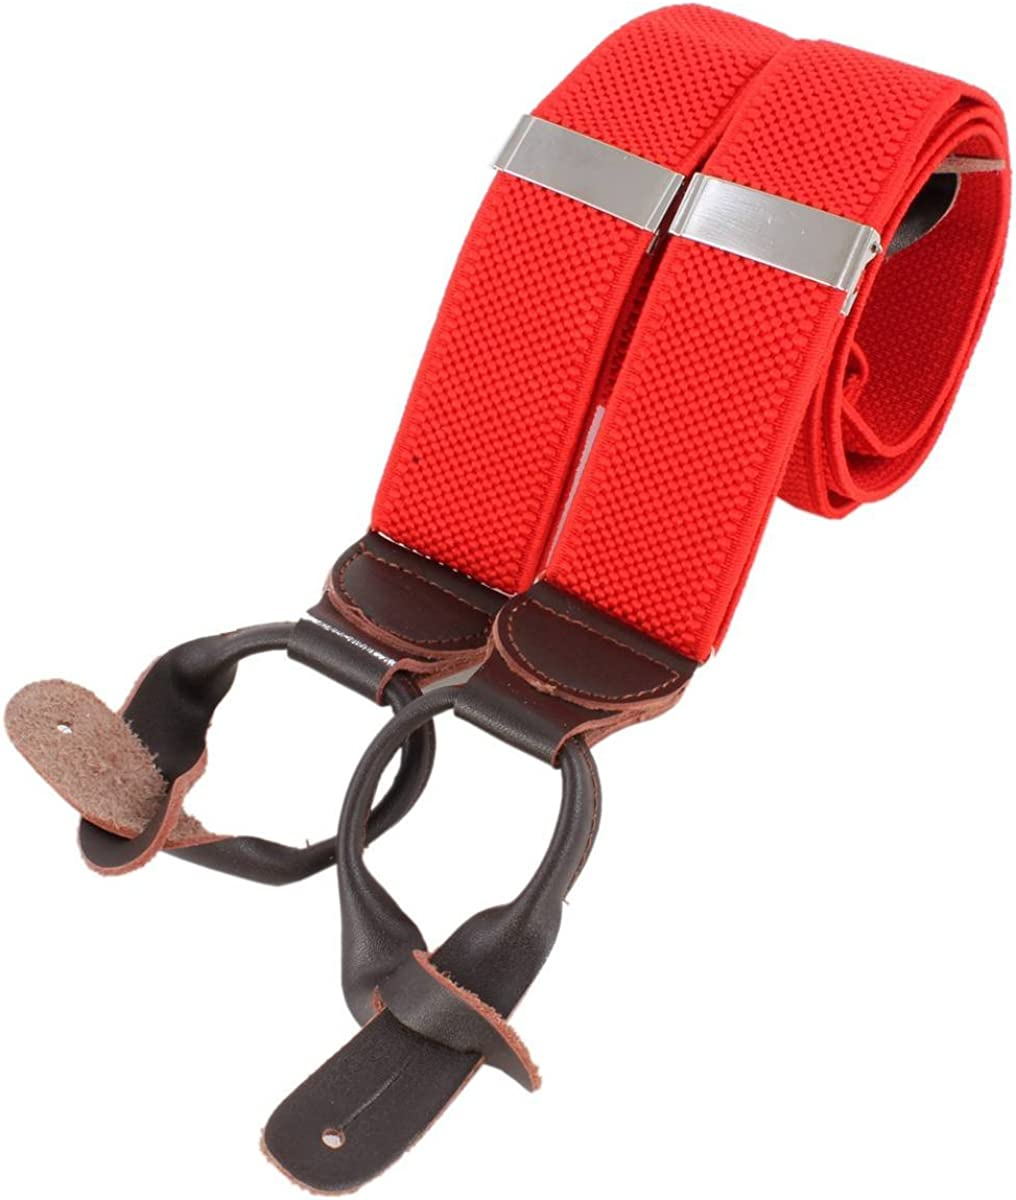 Knightsbridge Neckwear Mens Luxury Braces - Red